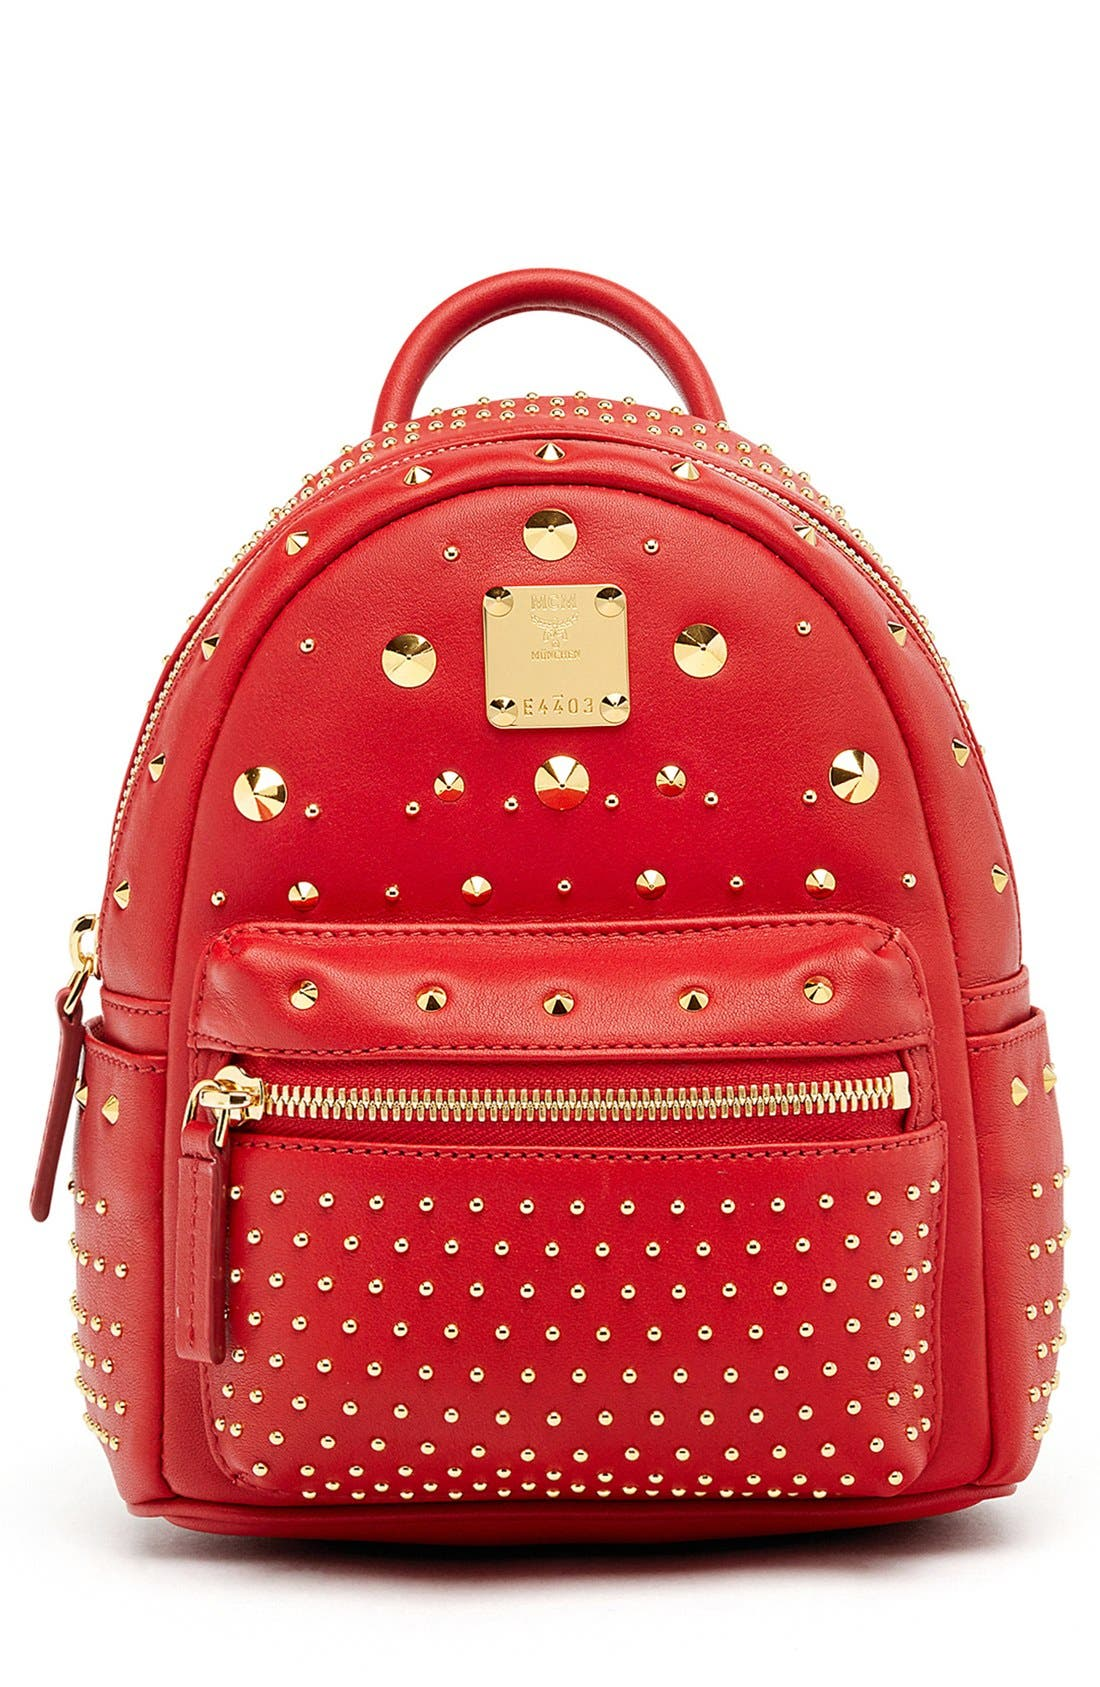 Alternate Image 1 Selected - MCM 'X Mini Stark - Bebe Boo' Studded Leather Backpack